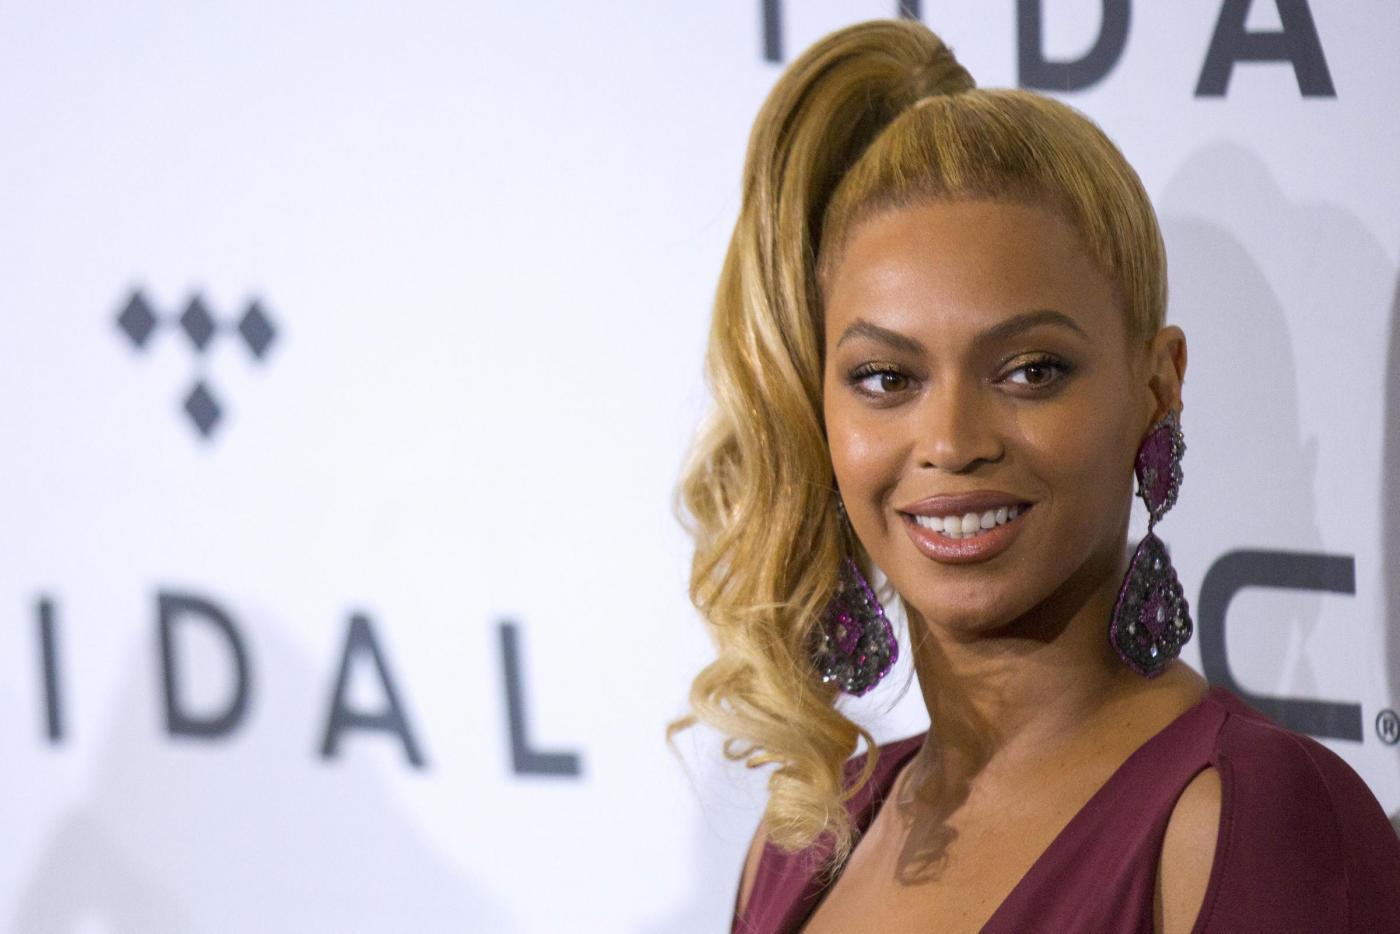 Beyoncé sceglie il made in Italy: scarpe firmate Antonia Capri